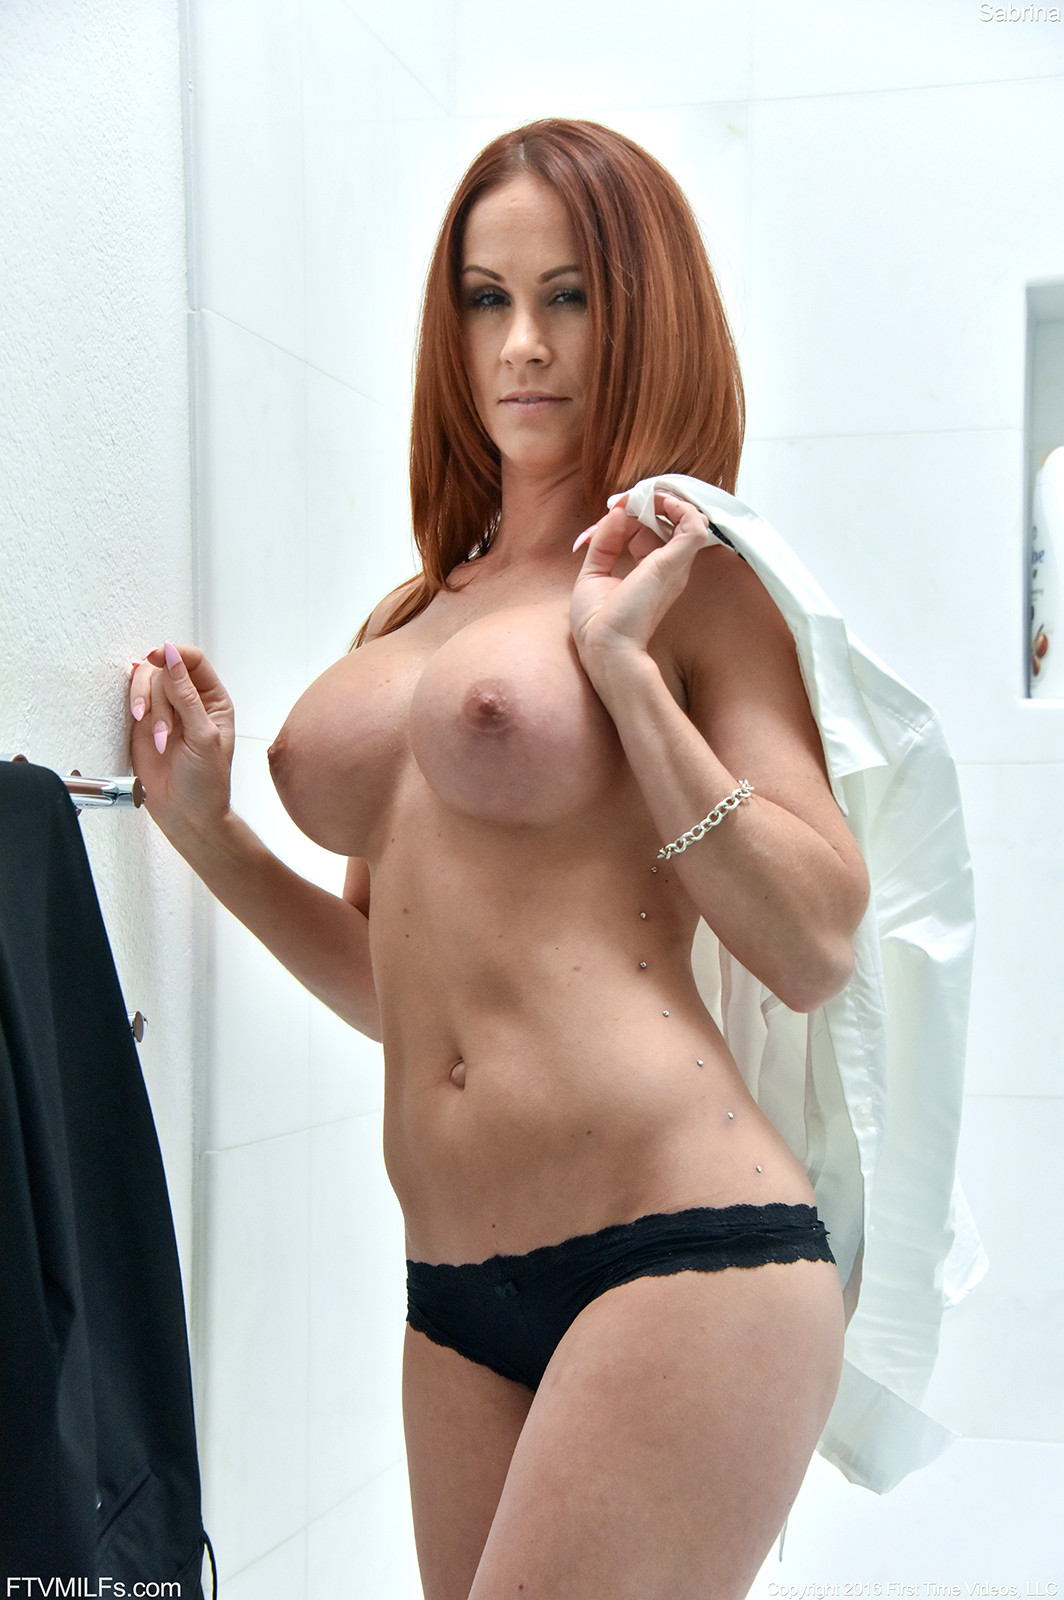 Babe Today Ftv Milfs Sabrina Cyns Famous Redhead Xxx Pov -9194